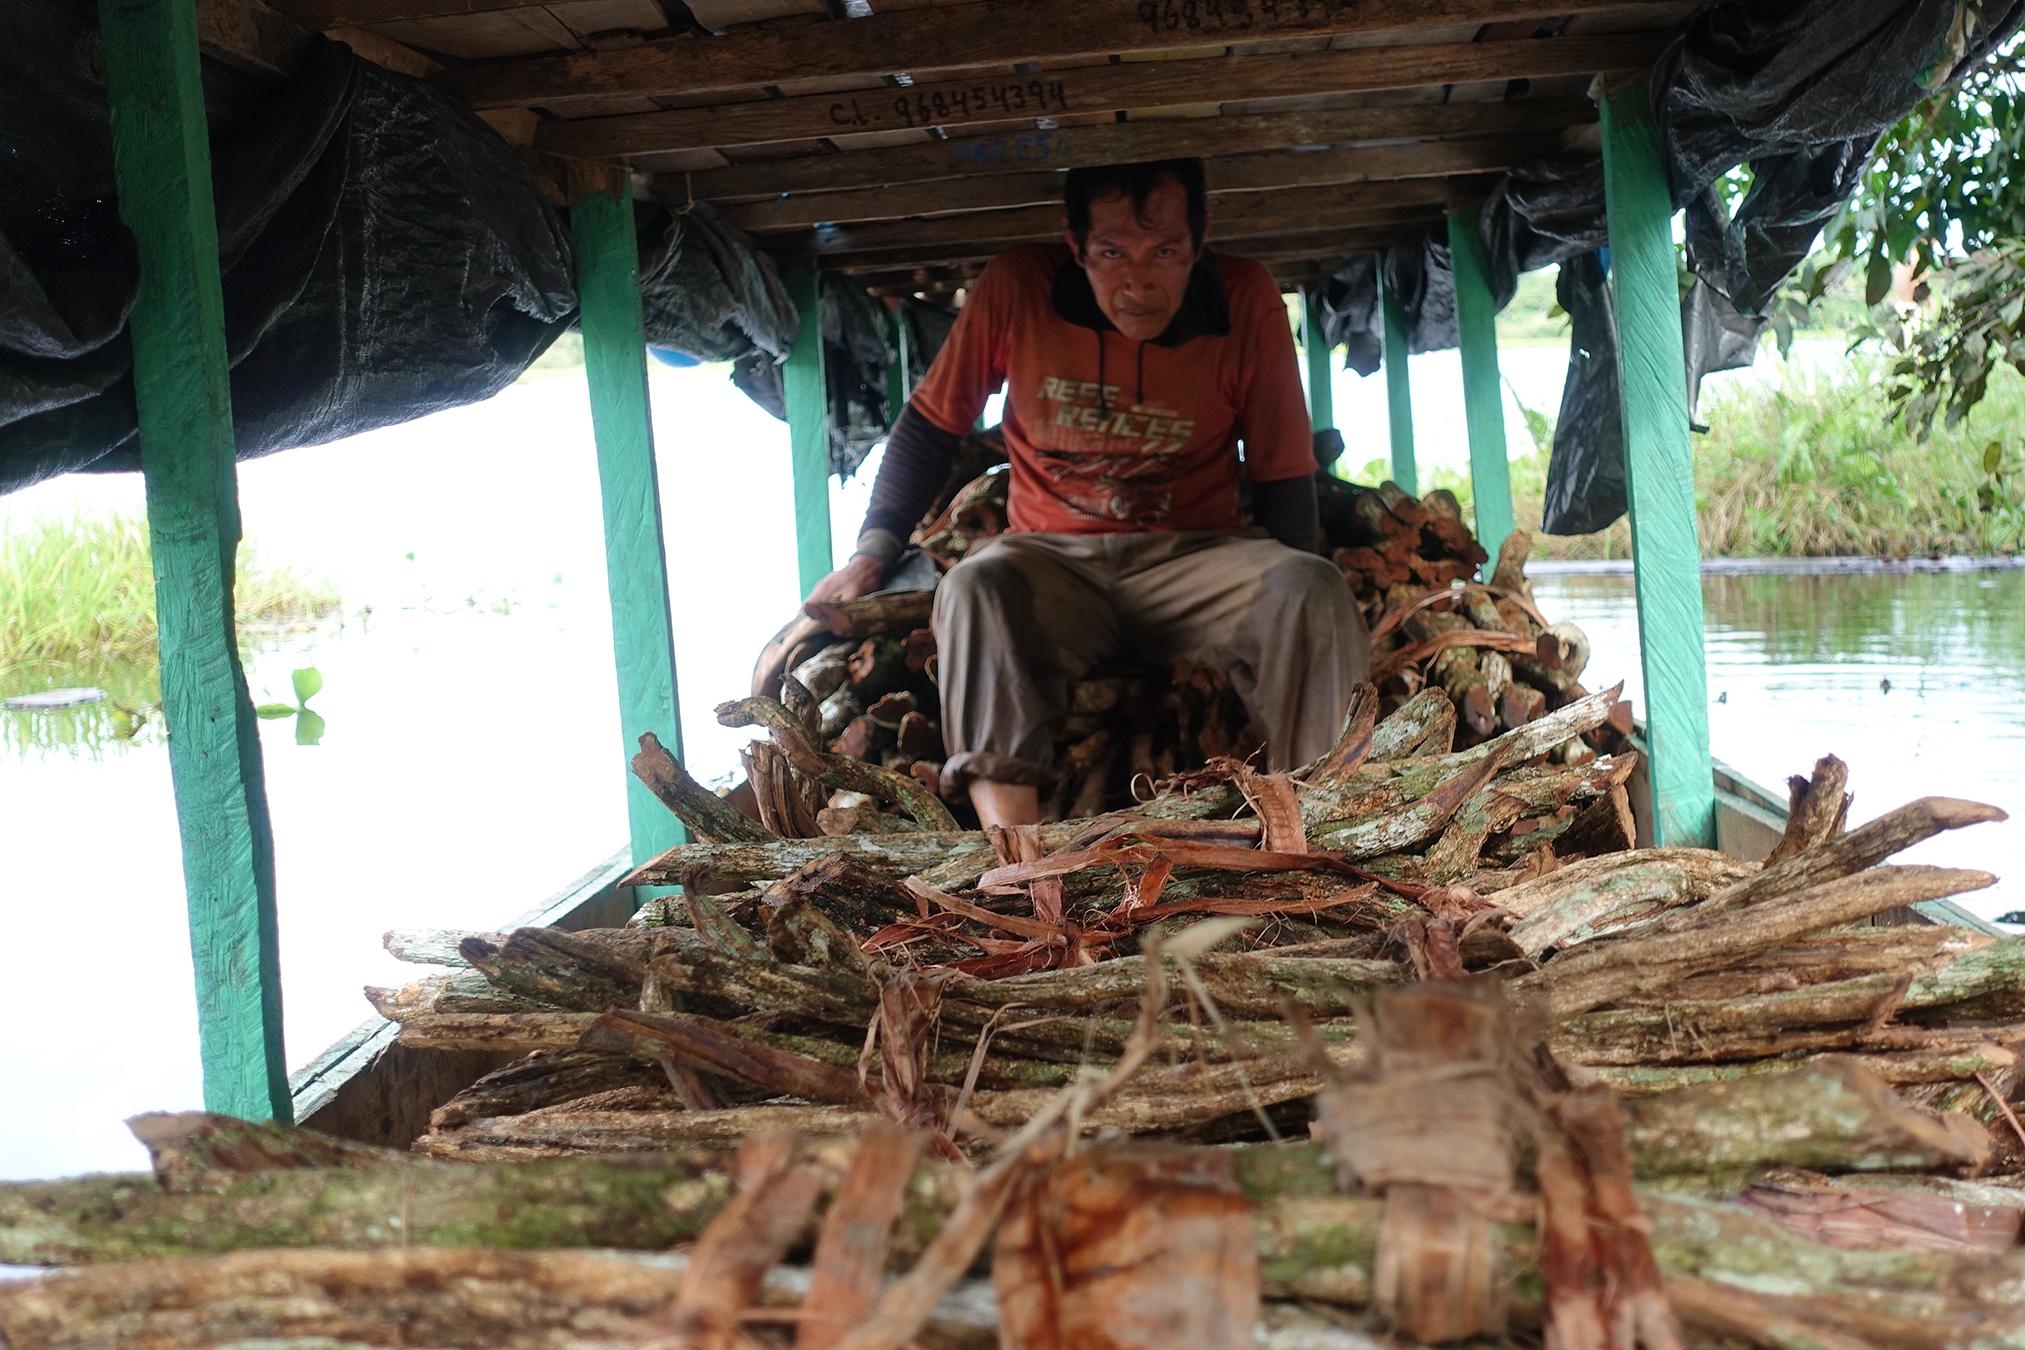 Amazon Ayahuasca Sustainability Study Conducted by Medicine Hunter